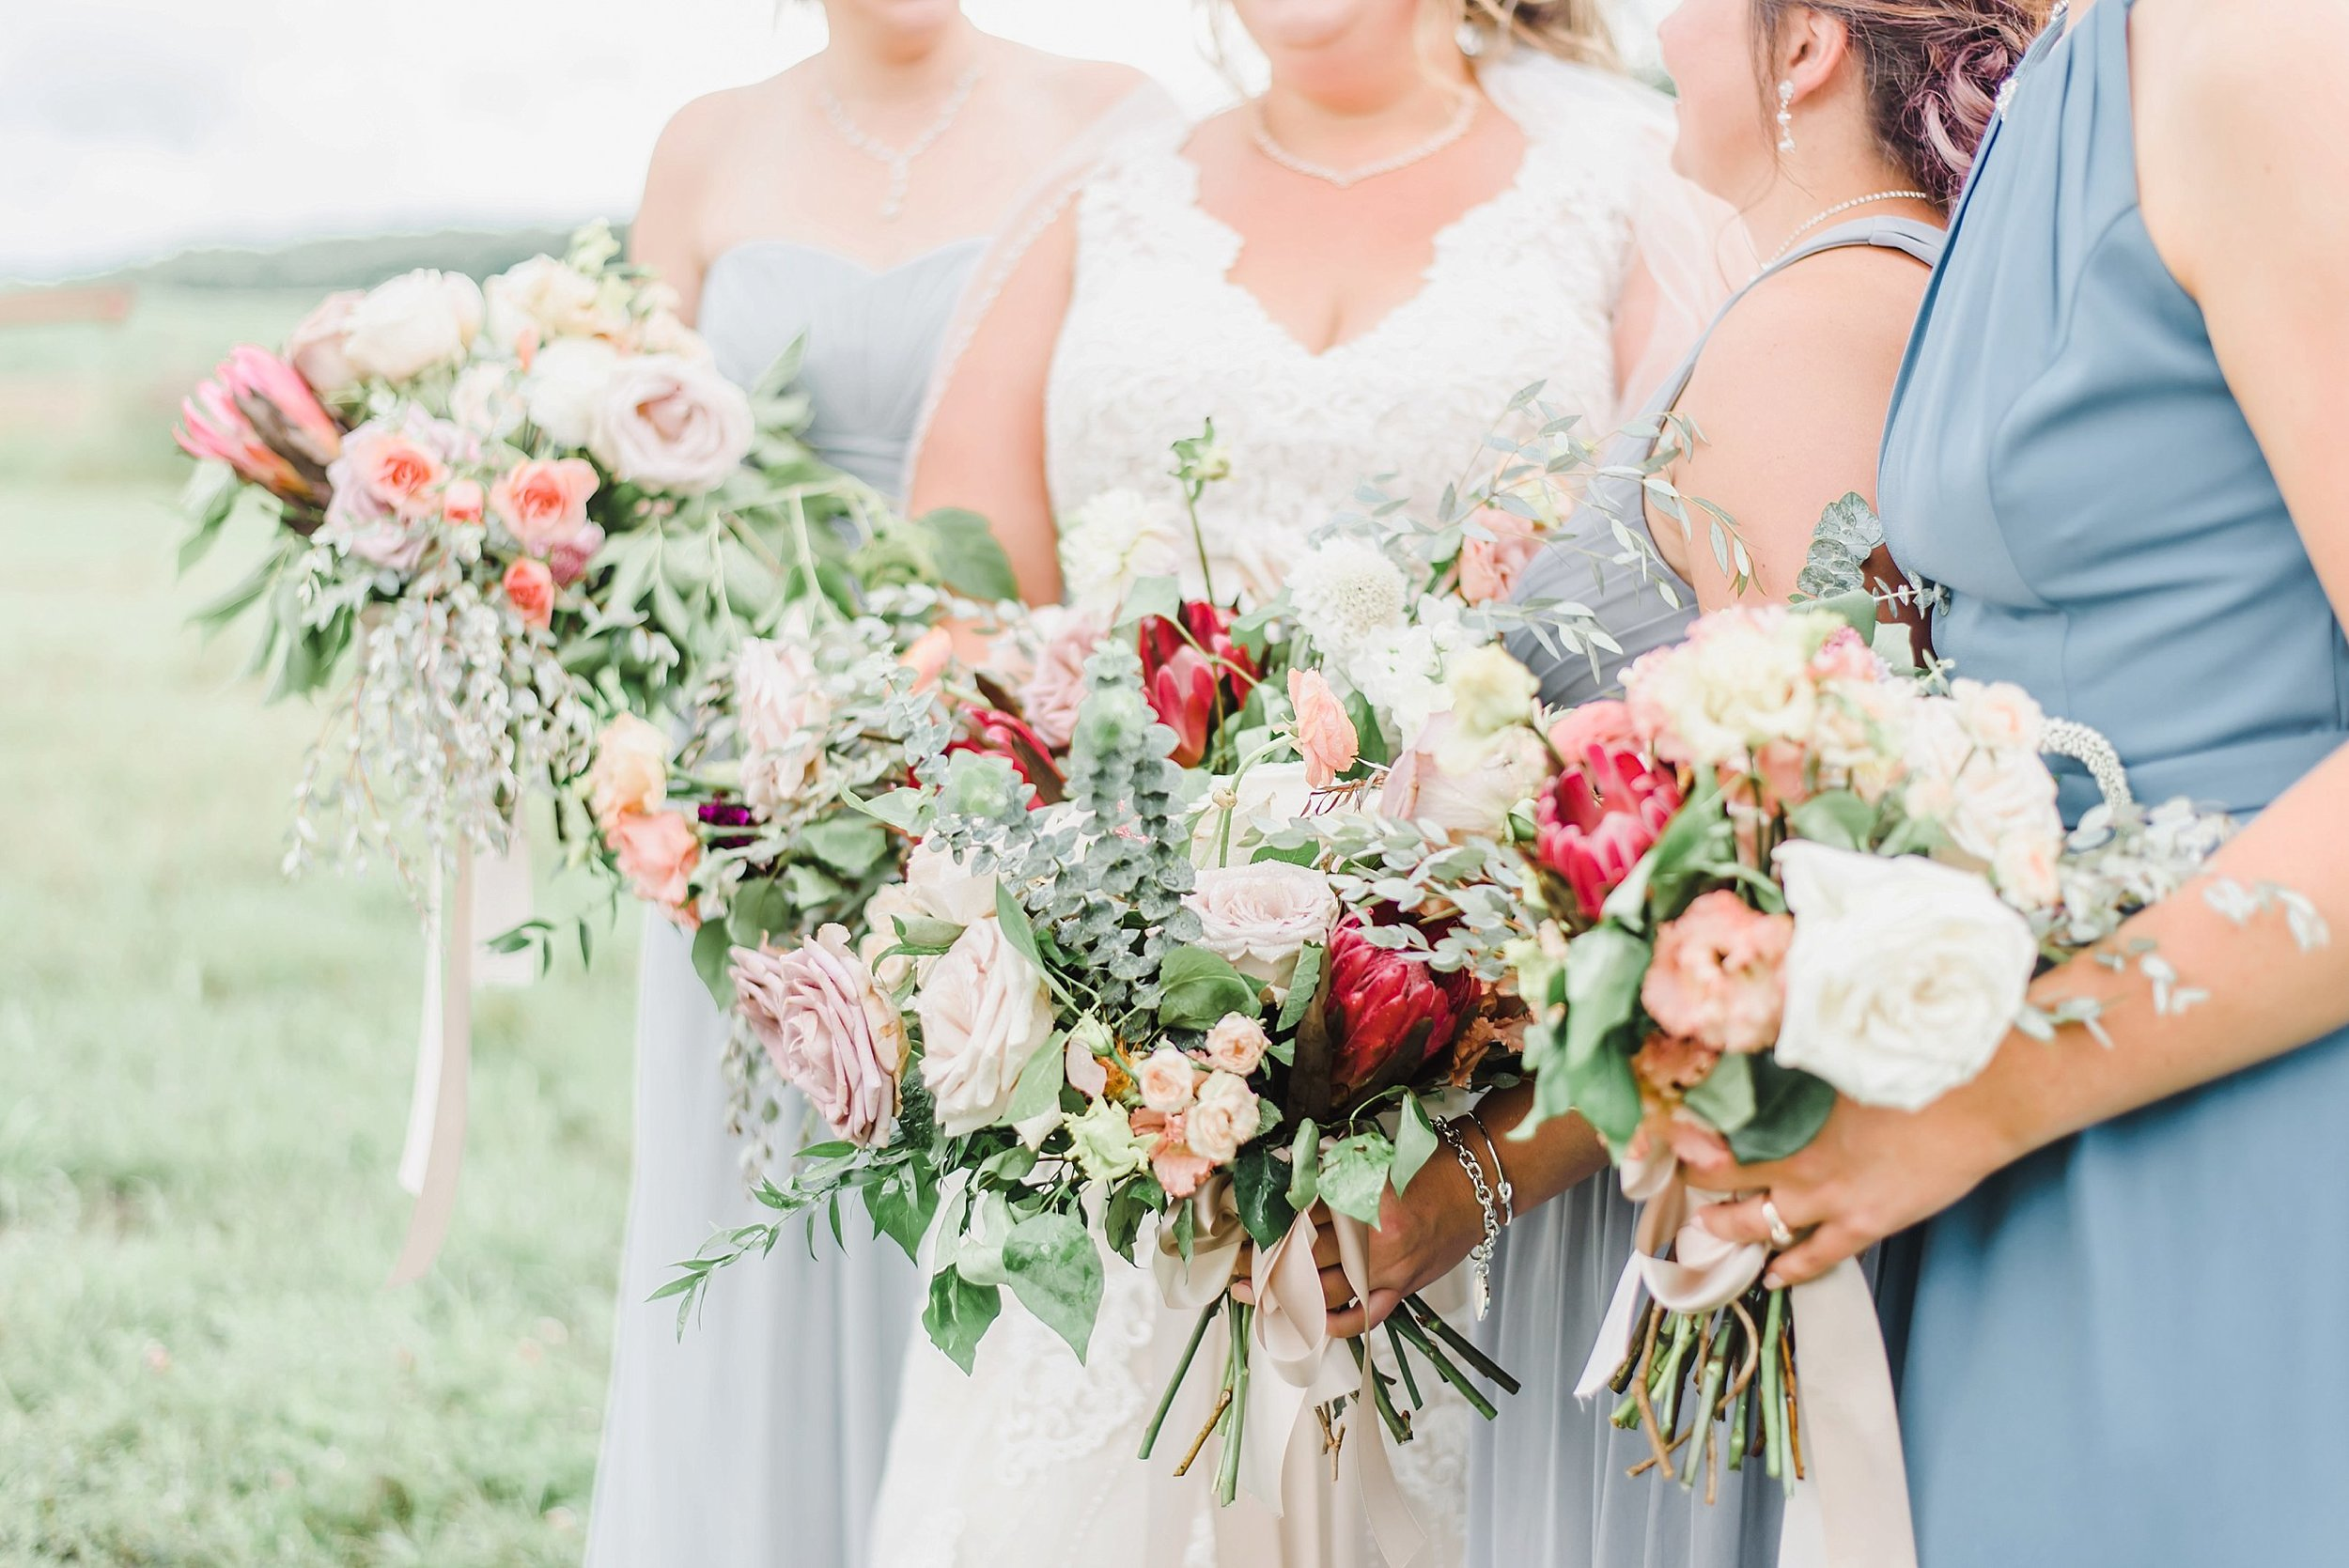 light airy indie fine art ottawa wedding photographer | Ali and Batoul Photography_0424.jpg